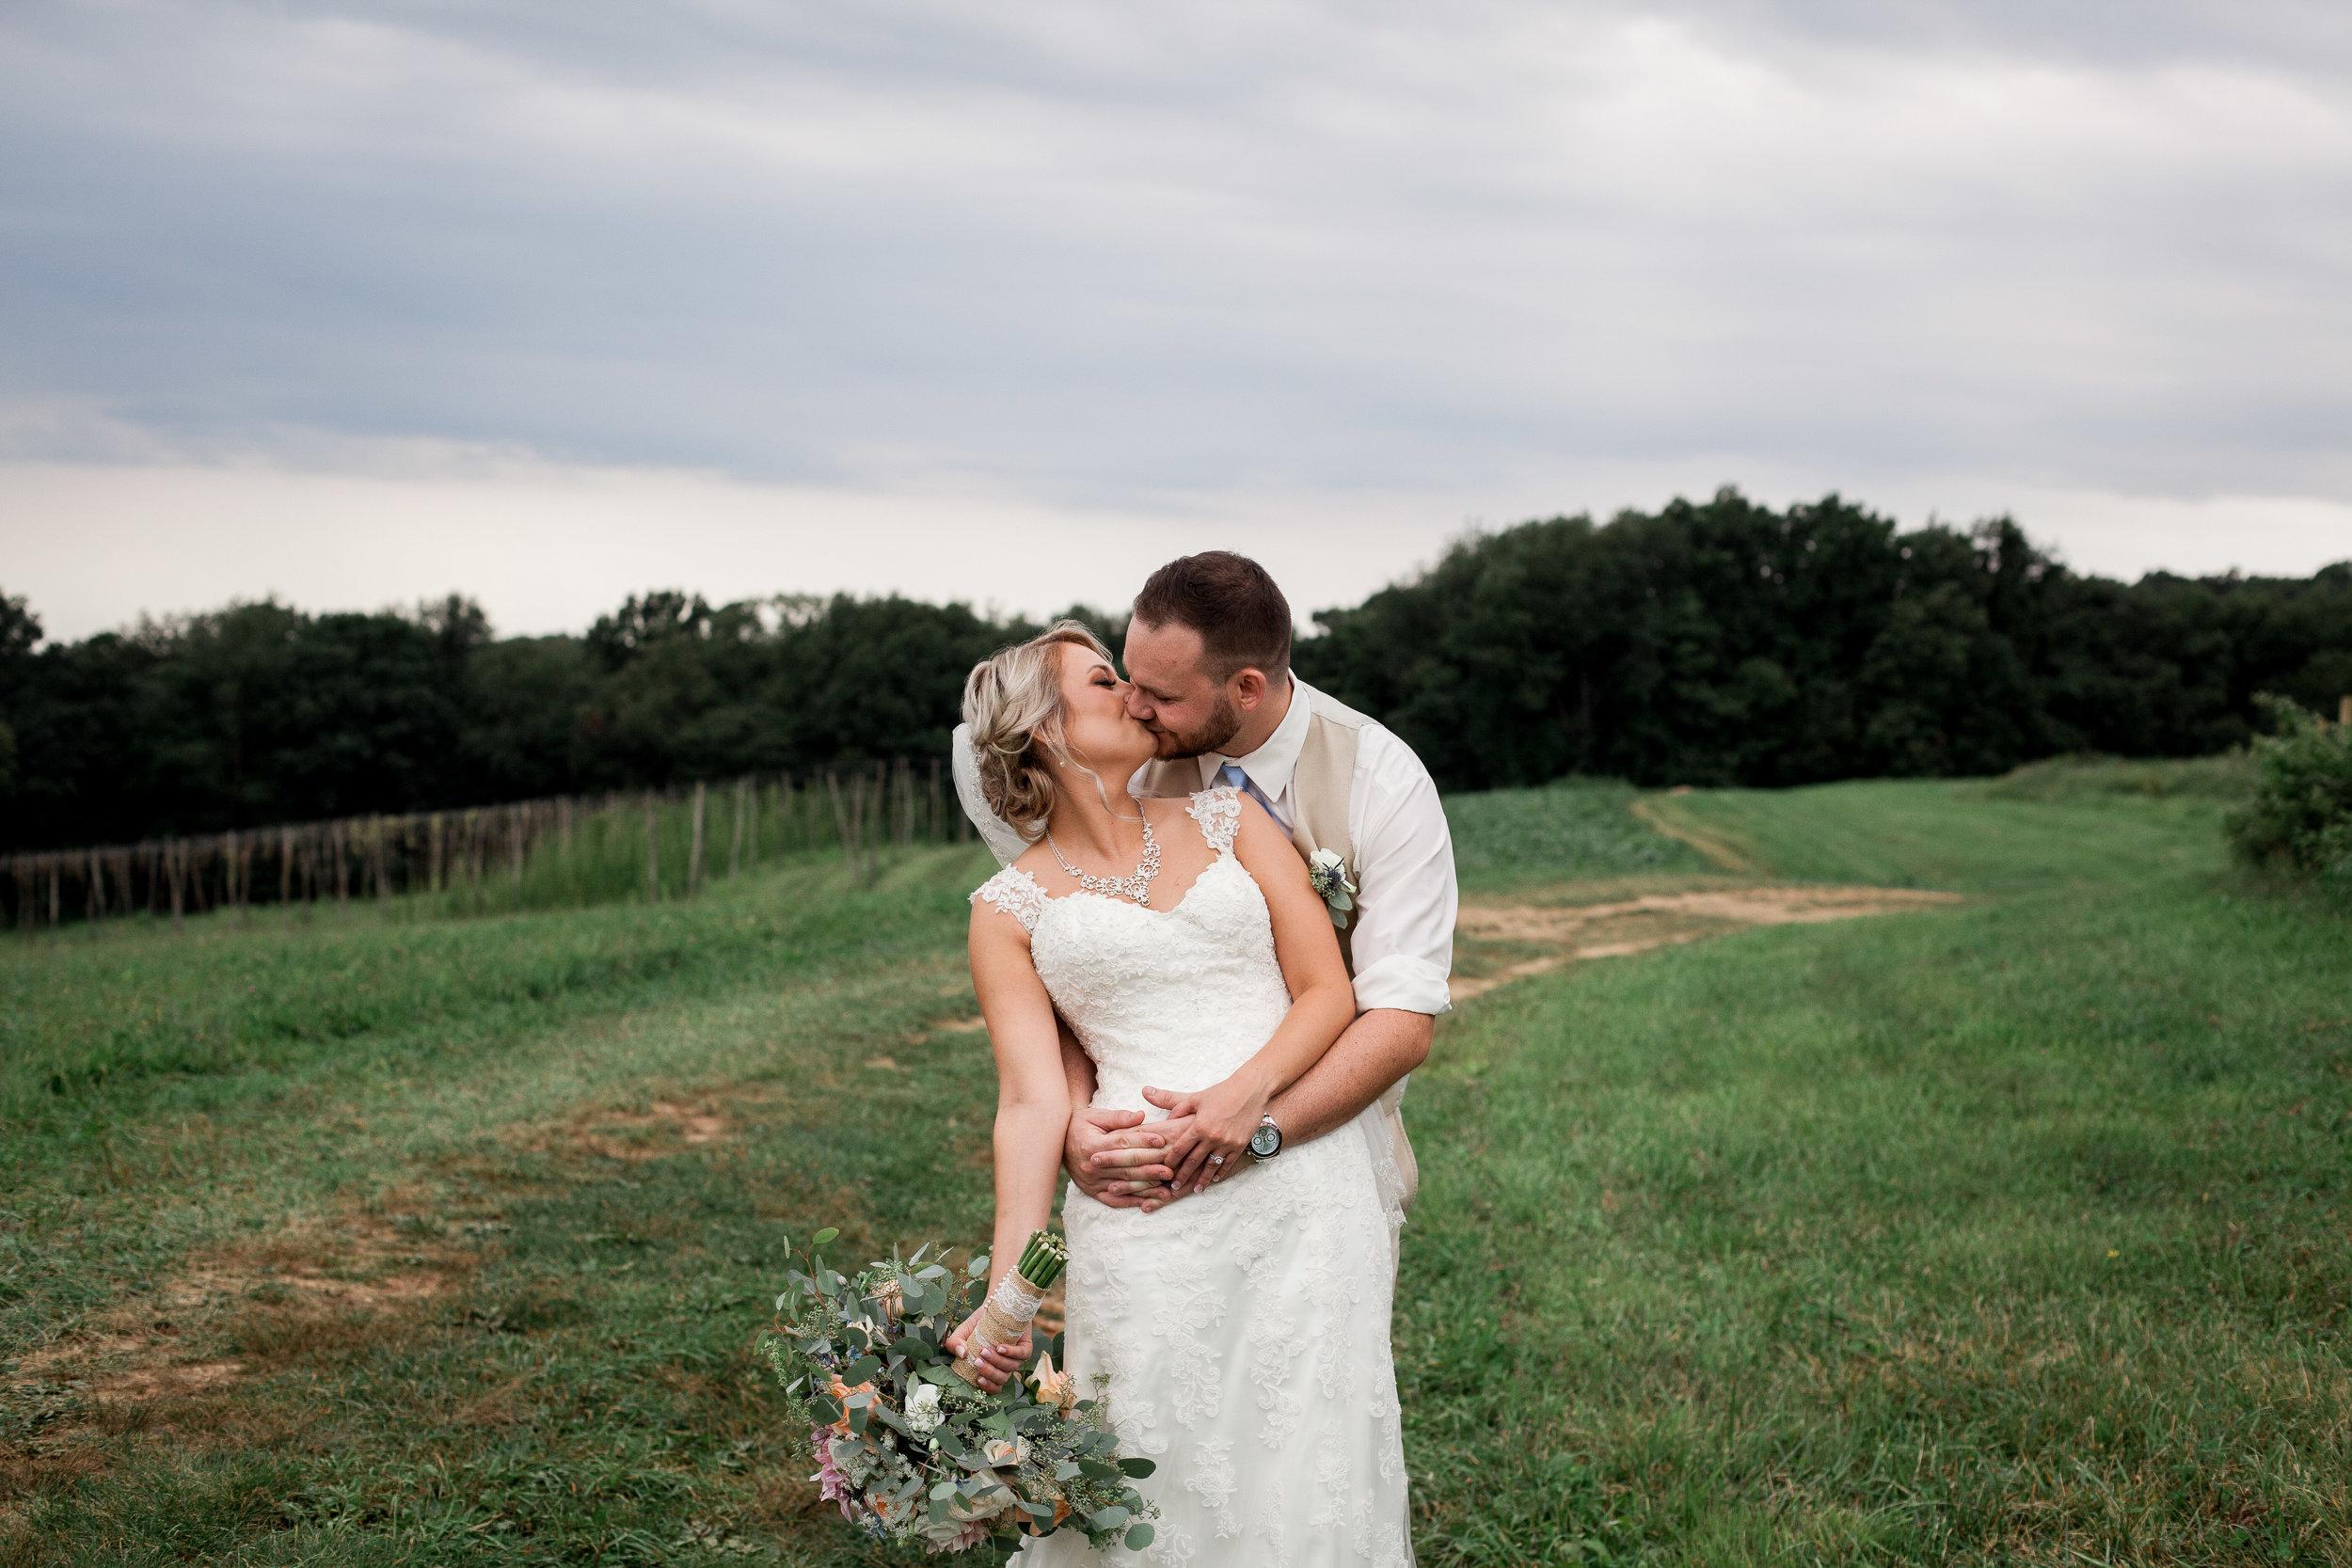 pittsburgh_wedding_photographer_liz_capuano-0961.jpg